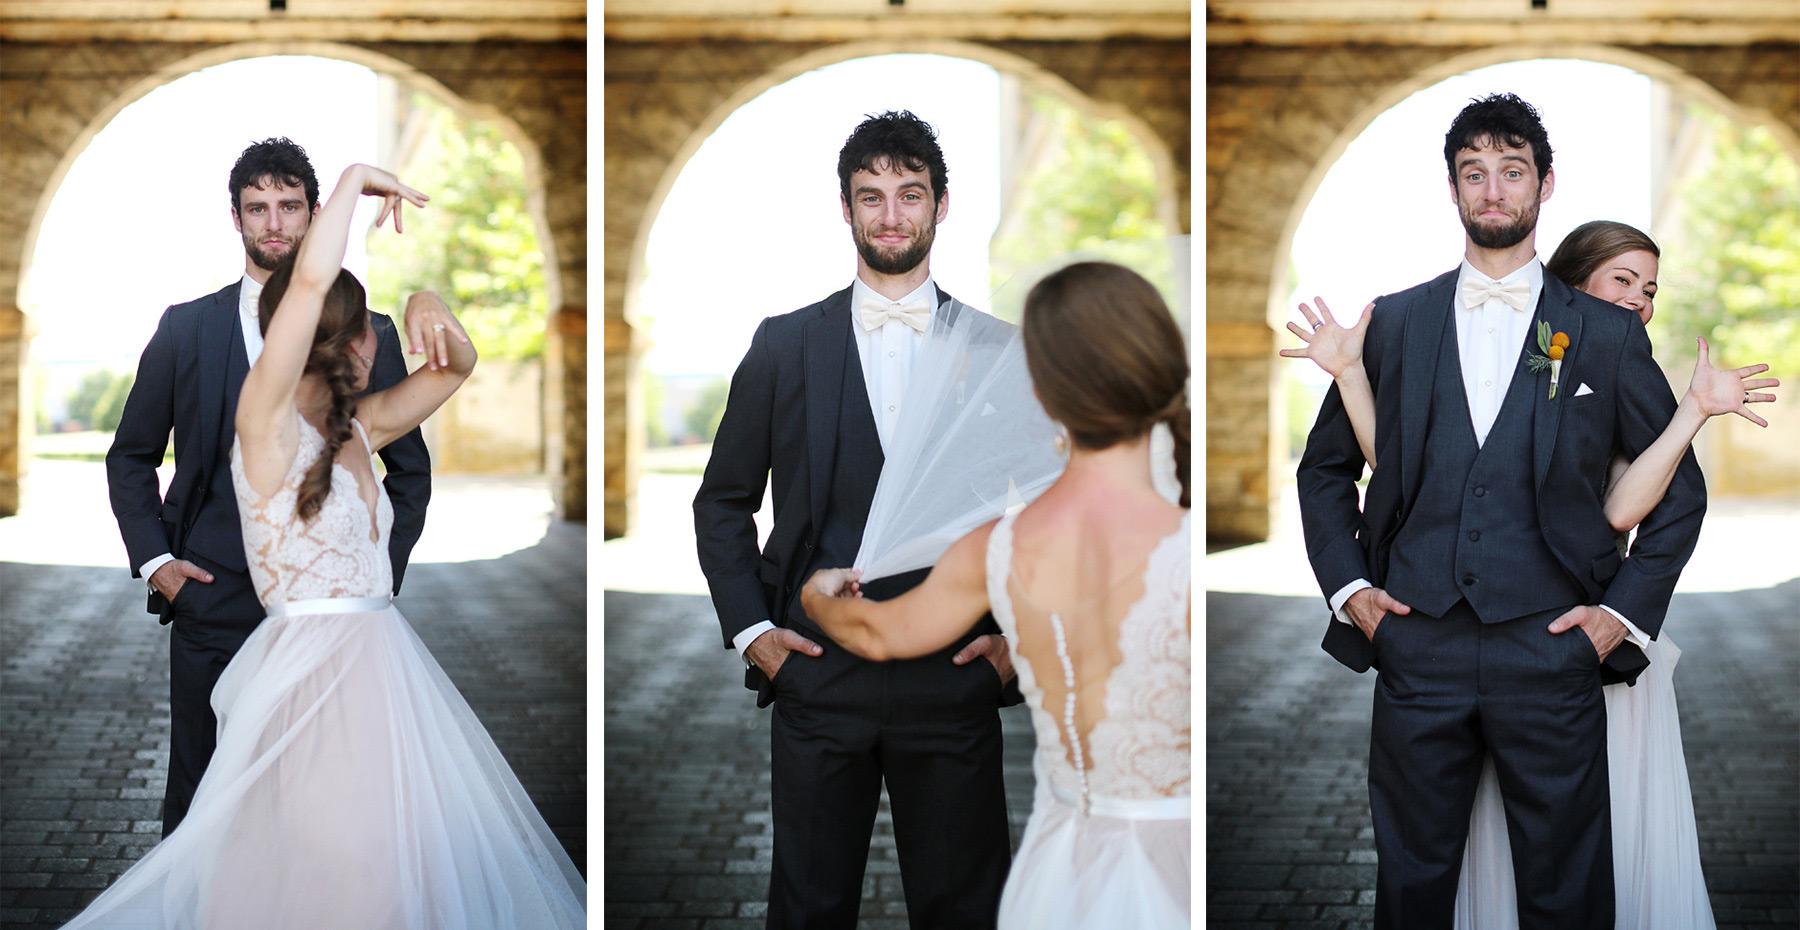 14-Minneapolis-Minnesota-Wedding-Photography-by-Vick-Photography-Downtown-Sarah-&-Tom.jpg